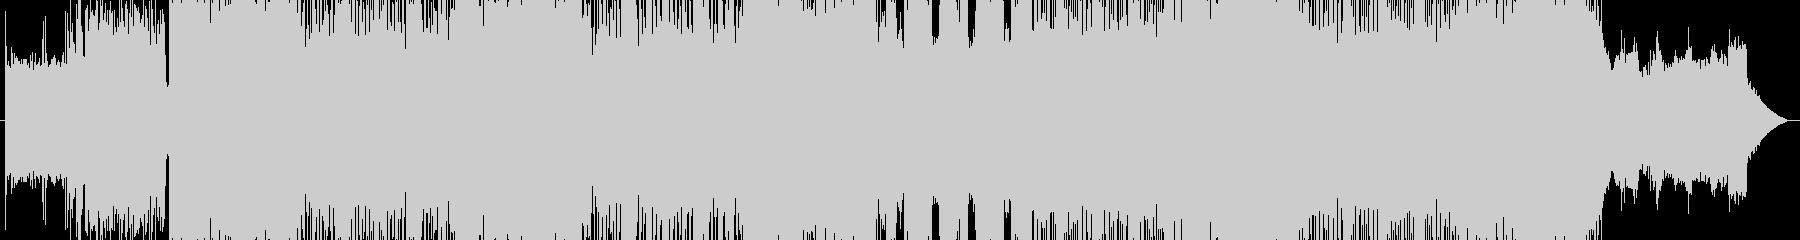 「HARD/HEAVY」BGM30の未再生の波形